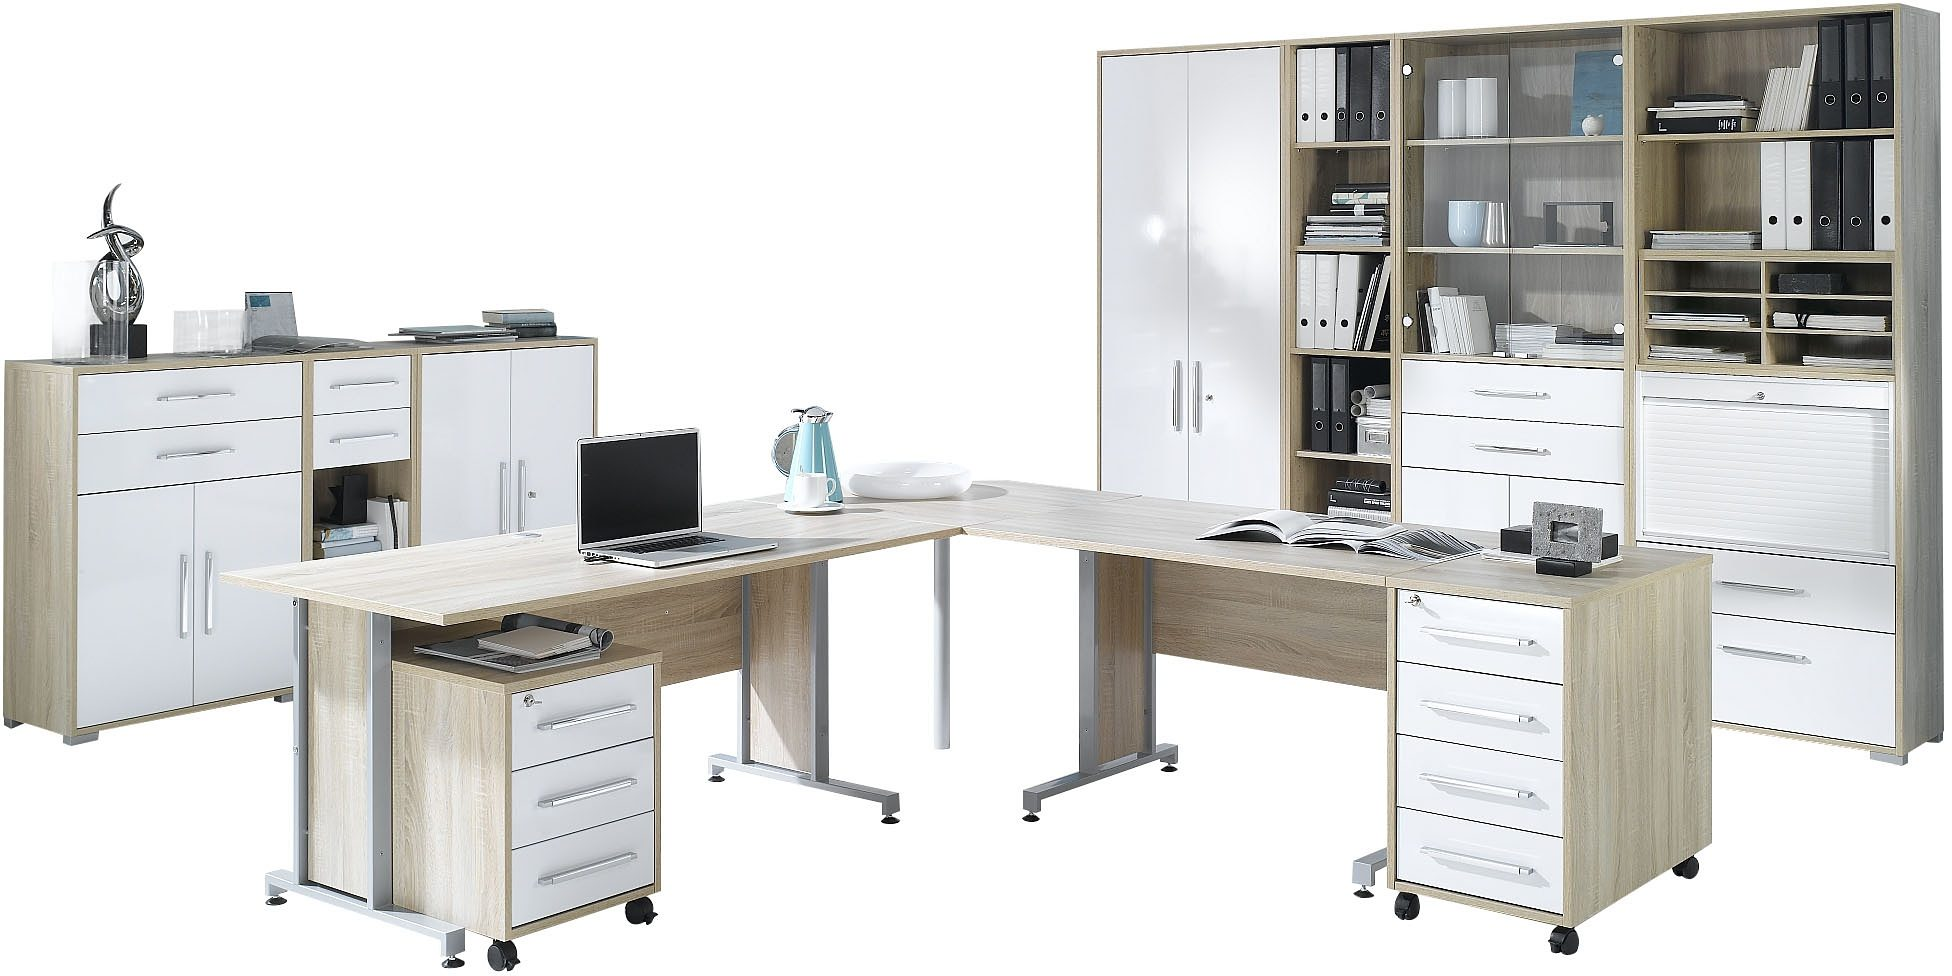 Maja Möbel Büro-Set 1205 (Set 6-tlg) | Büro > Büromöbel-Serien | Maja Möbel